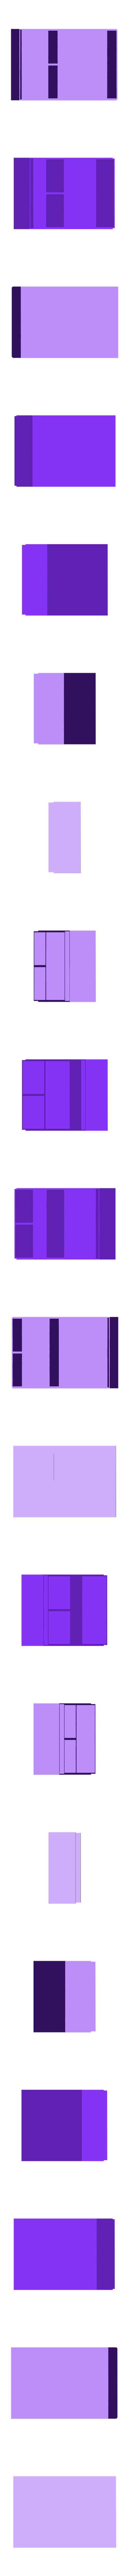 Nexus_Ops_-_Utility_Base.stl Download free STL file Nexus Ops Insert Cases • 3D printing object, Hardcore3D